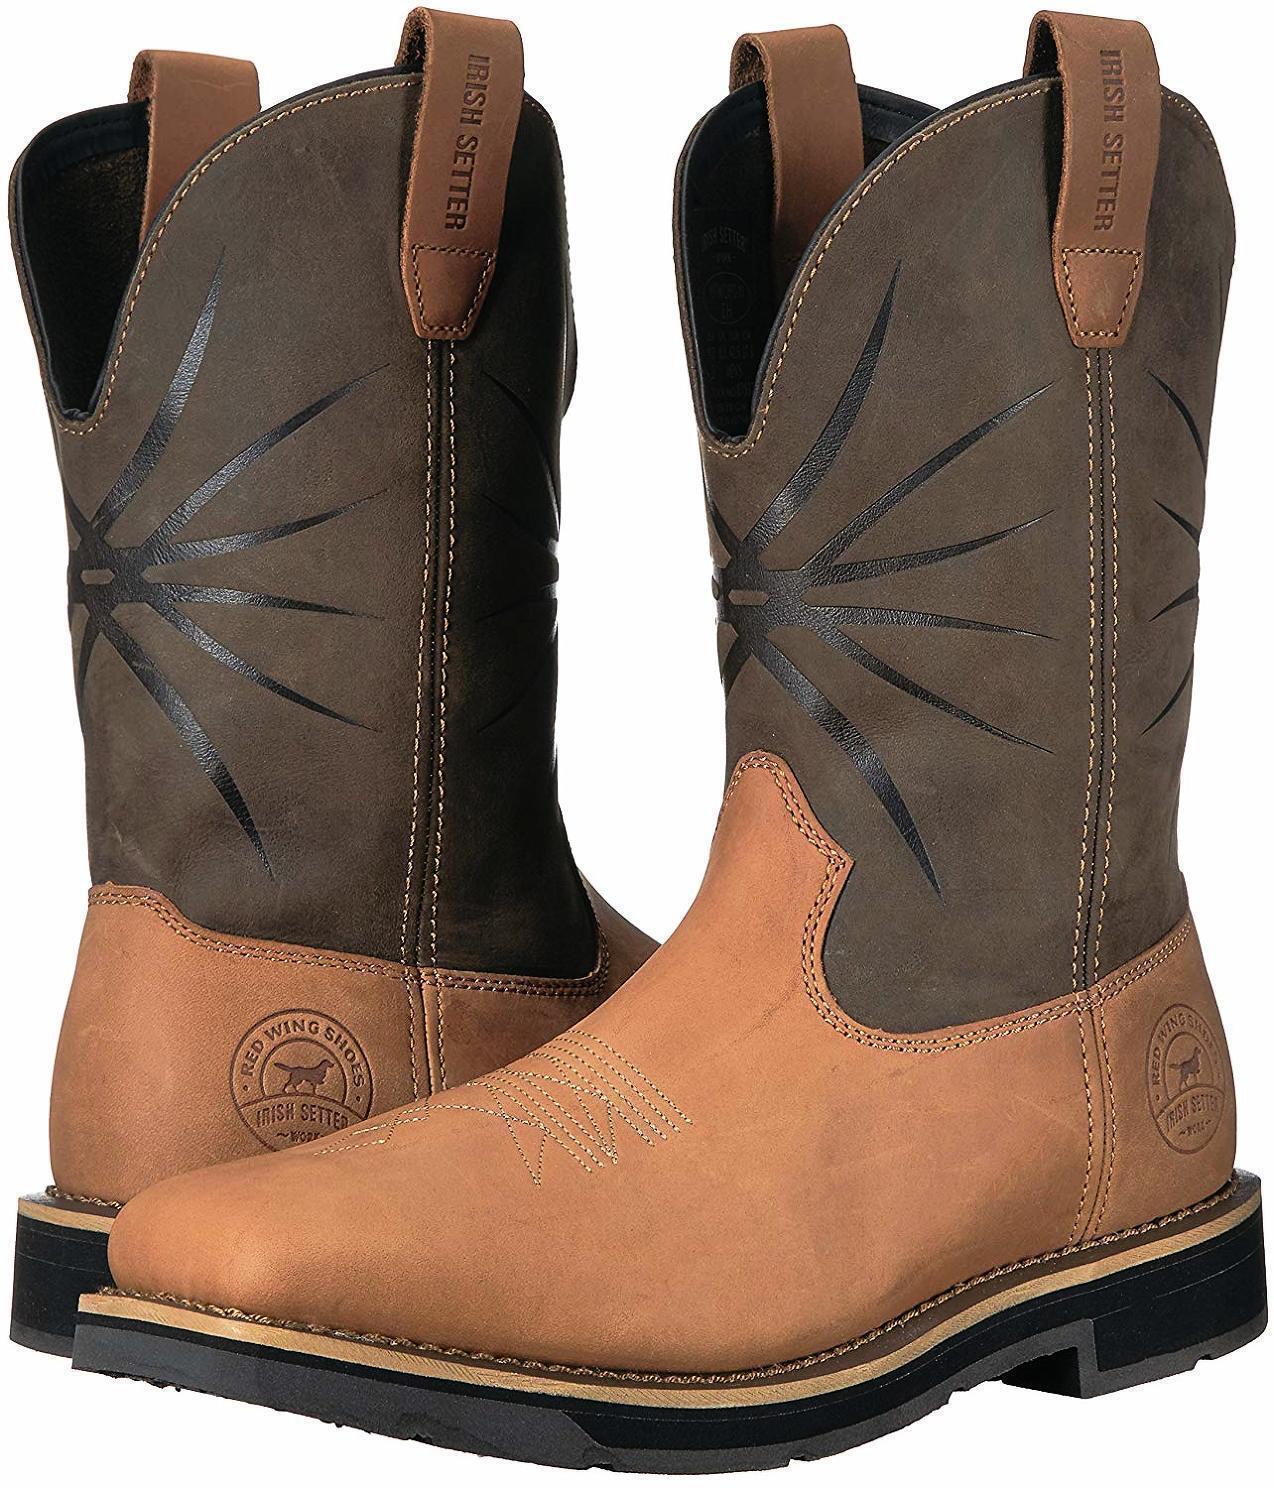 14 D Irish Setter Red Wing Walker 83937 men's Pull-on Western Work Cowboy Boots